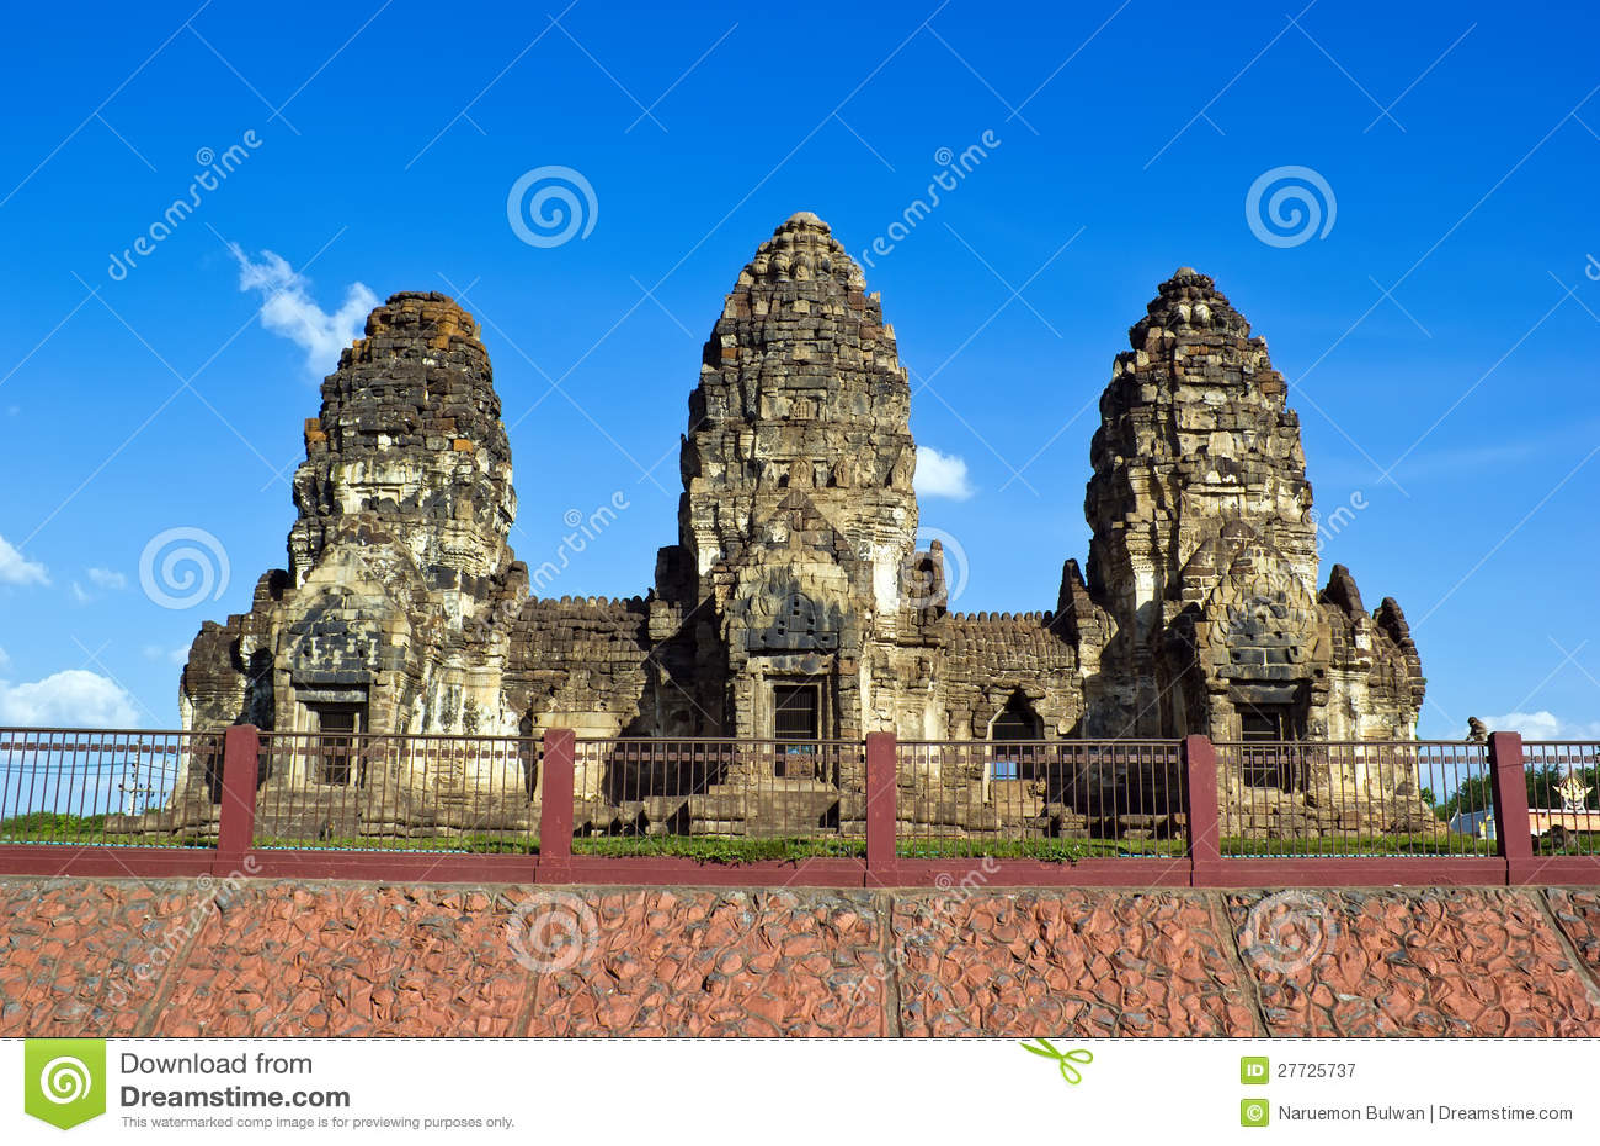 Phra Prang Sam Yot Royalty Free Stock Photography - Image: 27725737